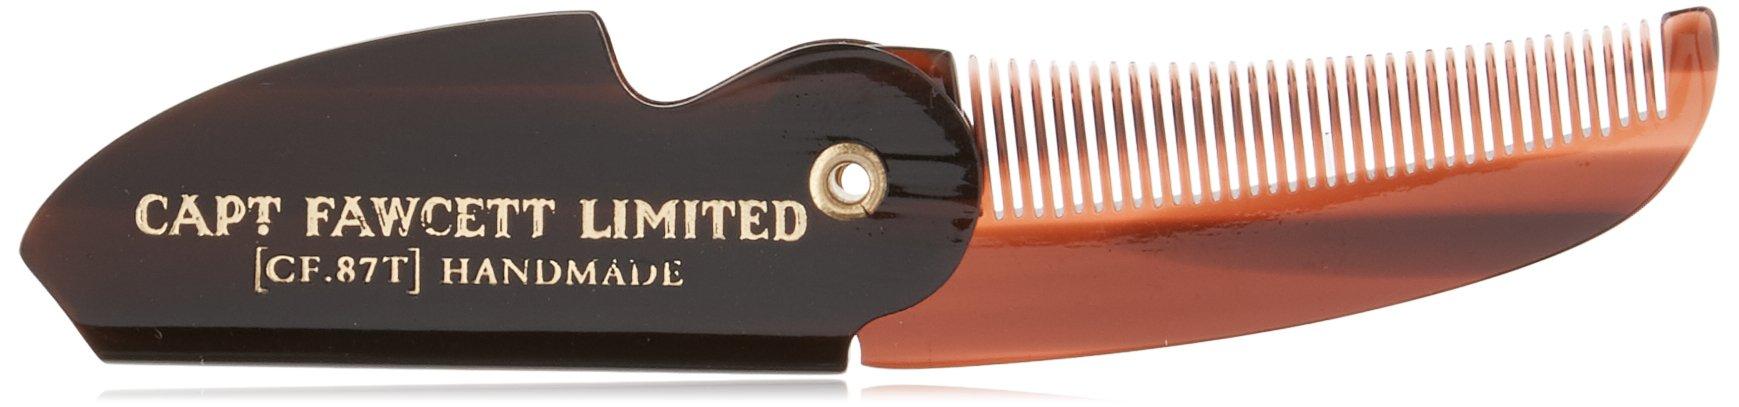 Captain Fawcett's Folding Pocket Moustache Comb - CF.87T - Made in England